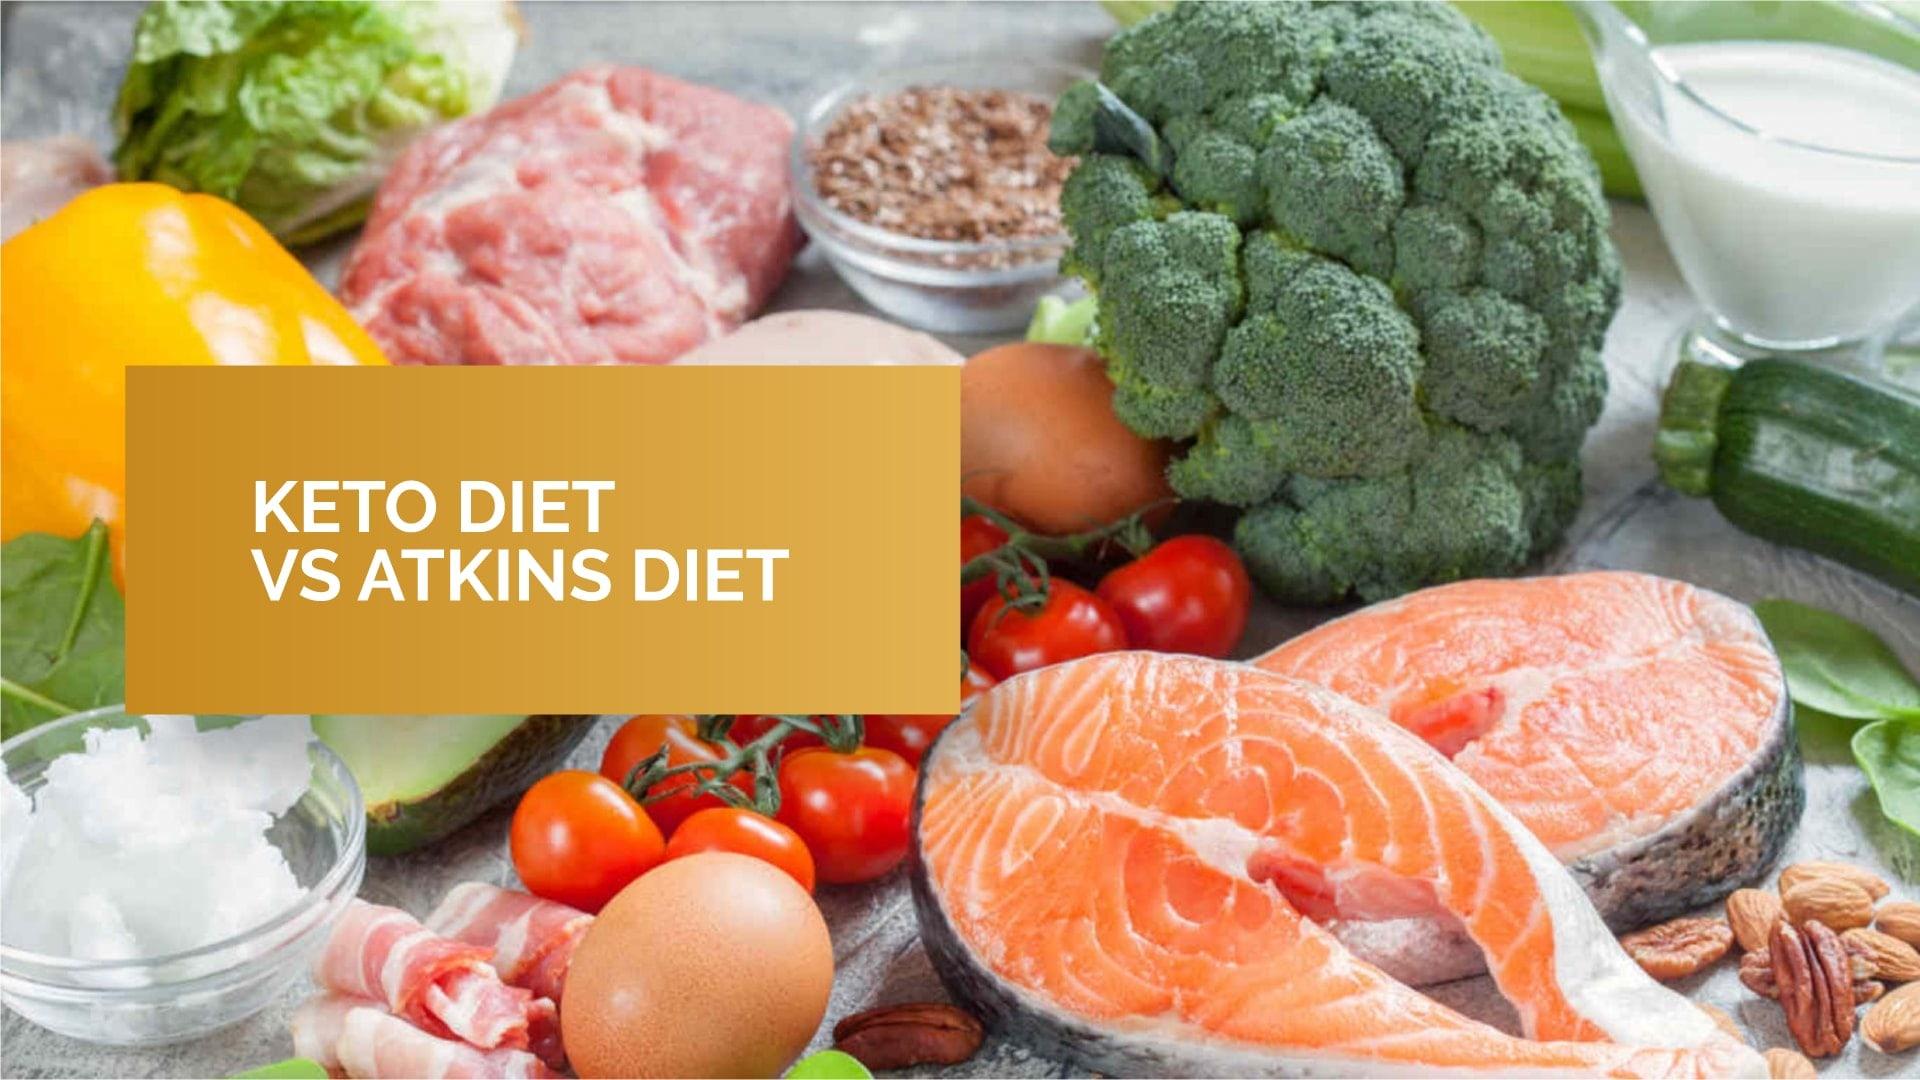 Keto Diet Vs Atkins Diet